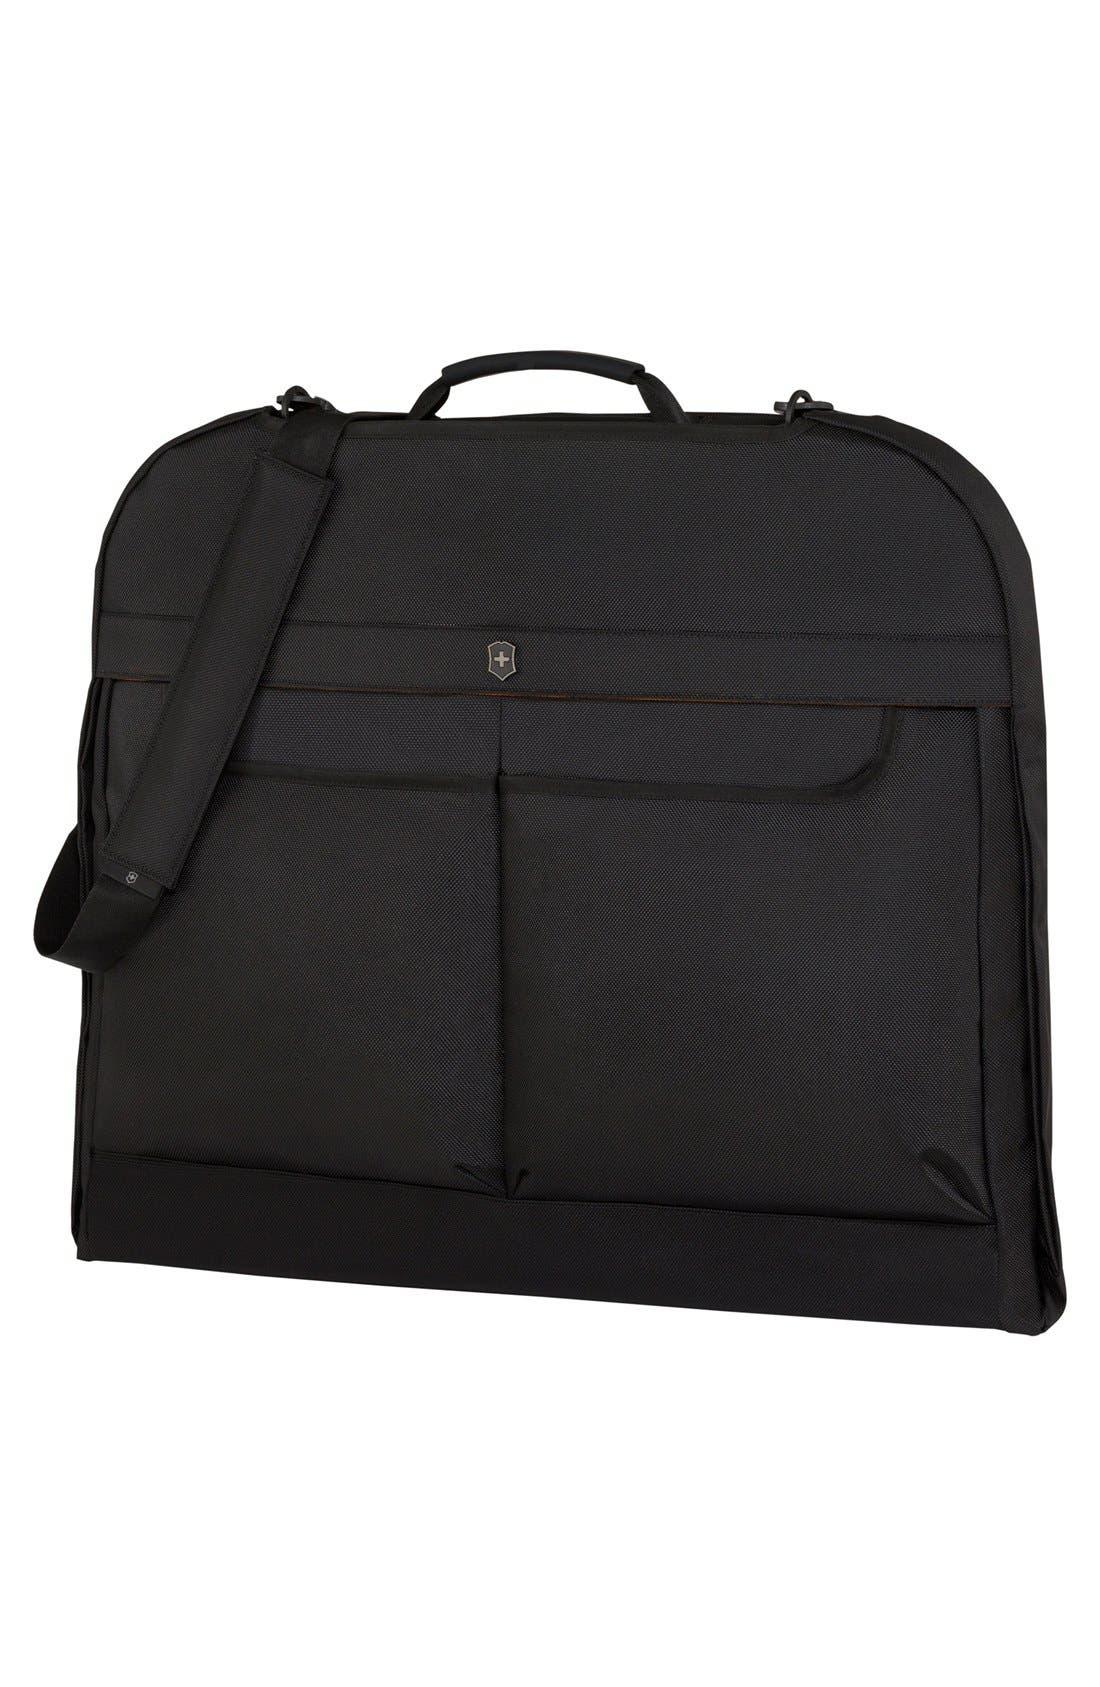 Main Image - Victorinox Swiss Army® WT 5.0 Deluxe Garment Bag